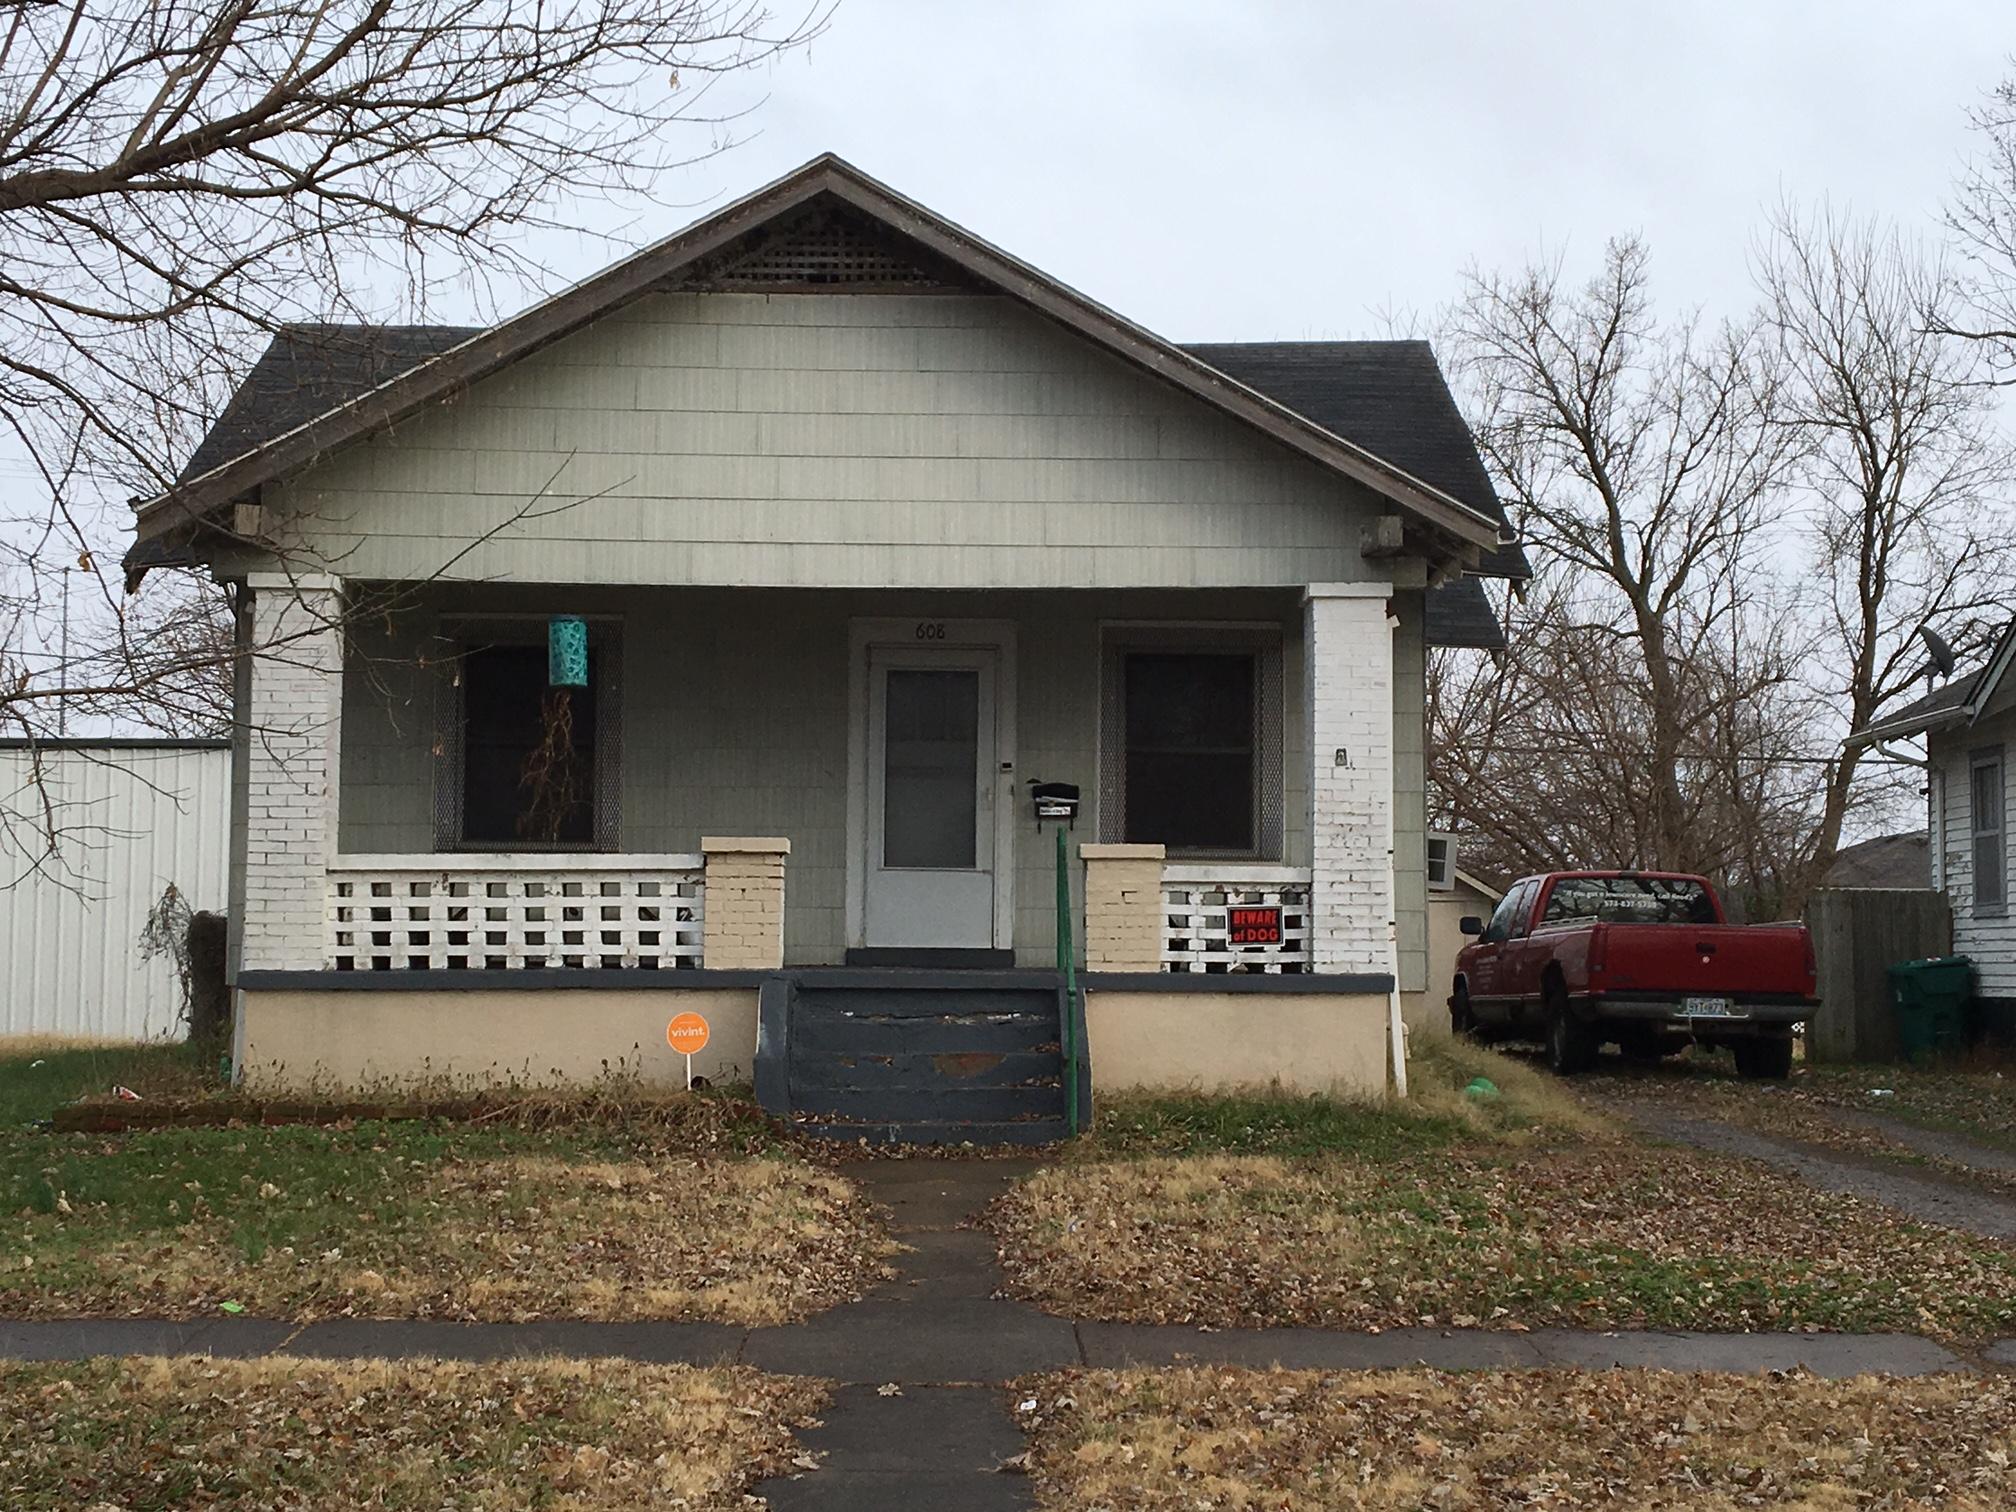 608 S Ellis St, Cape, Missouri 63701